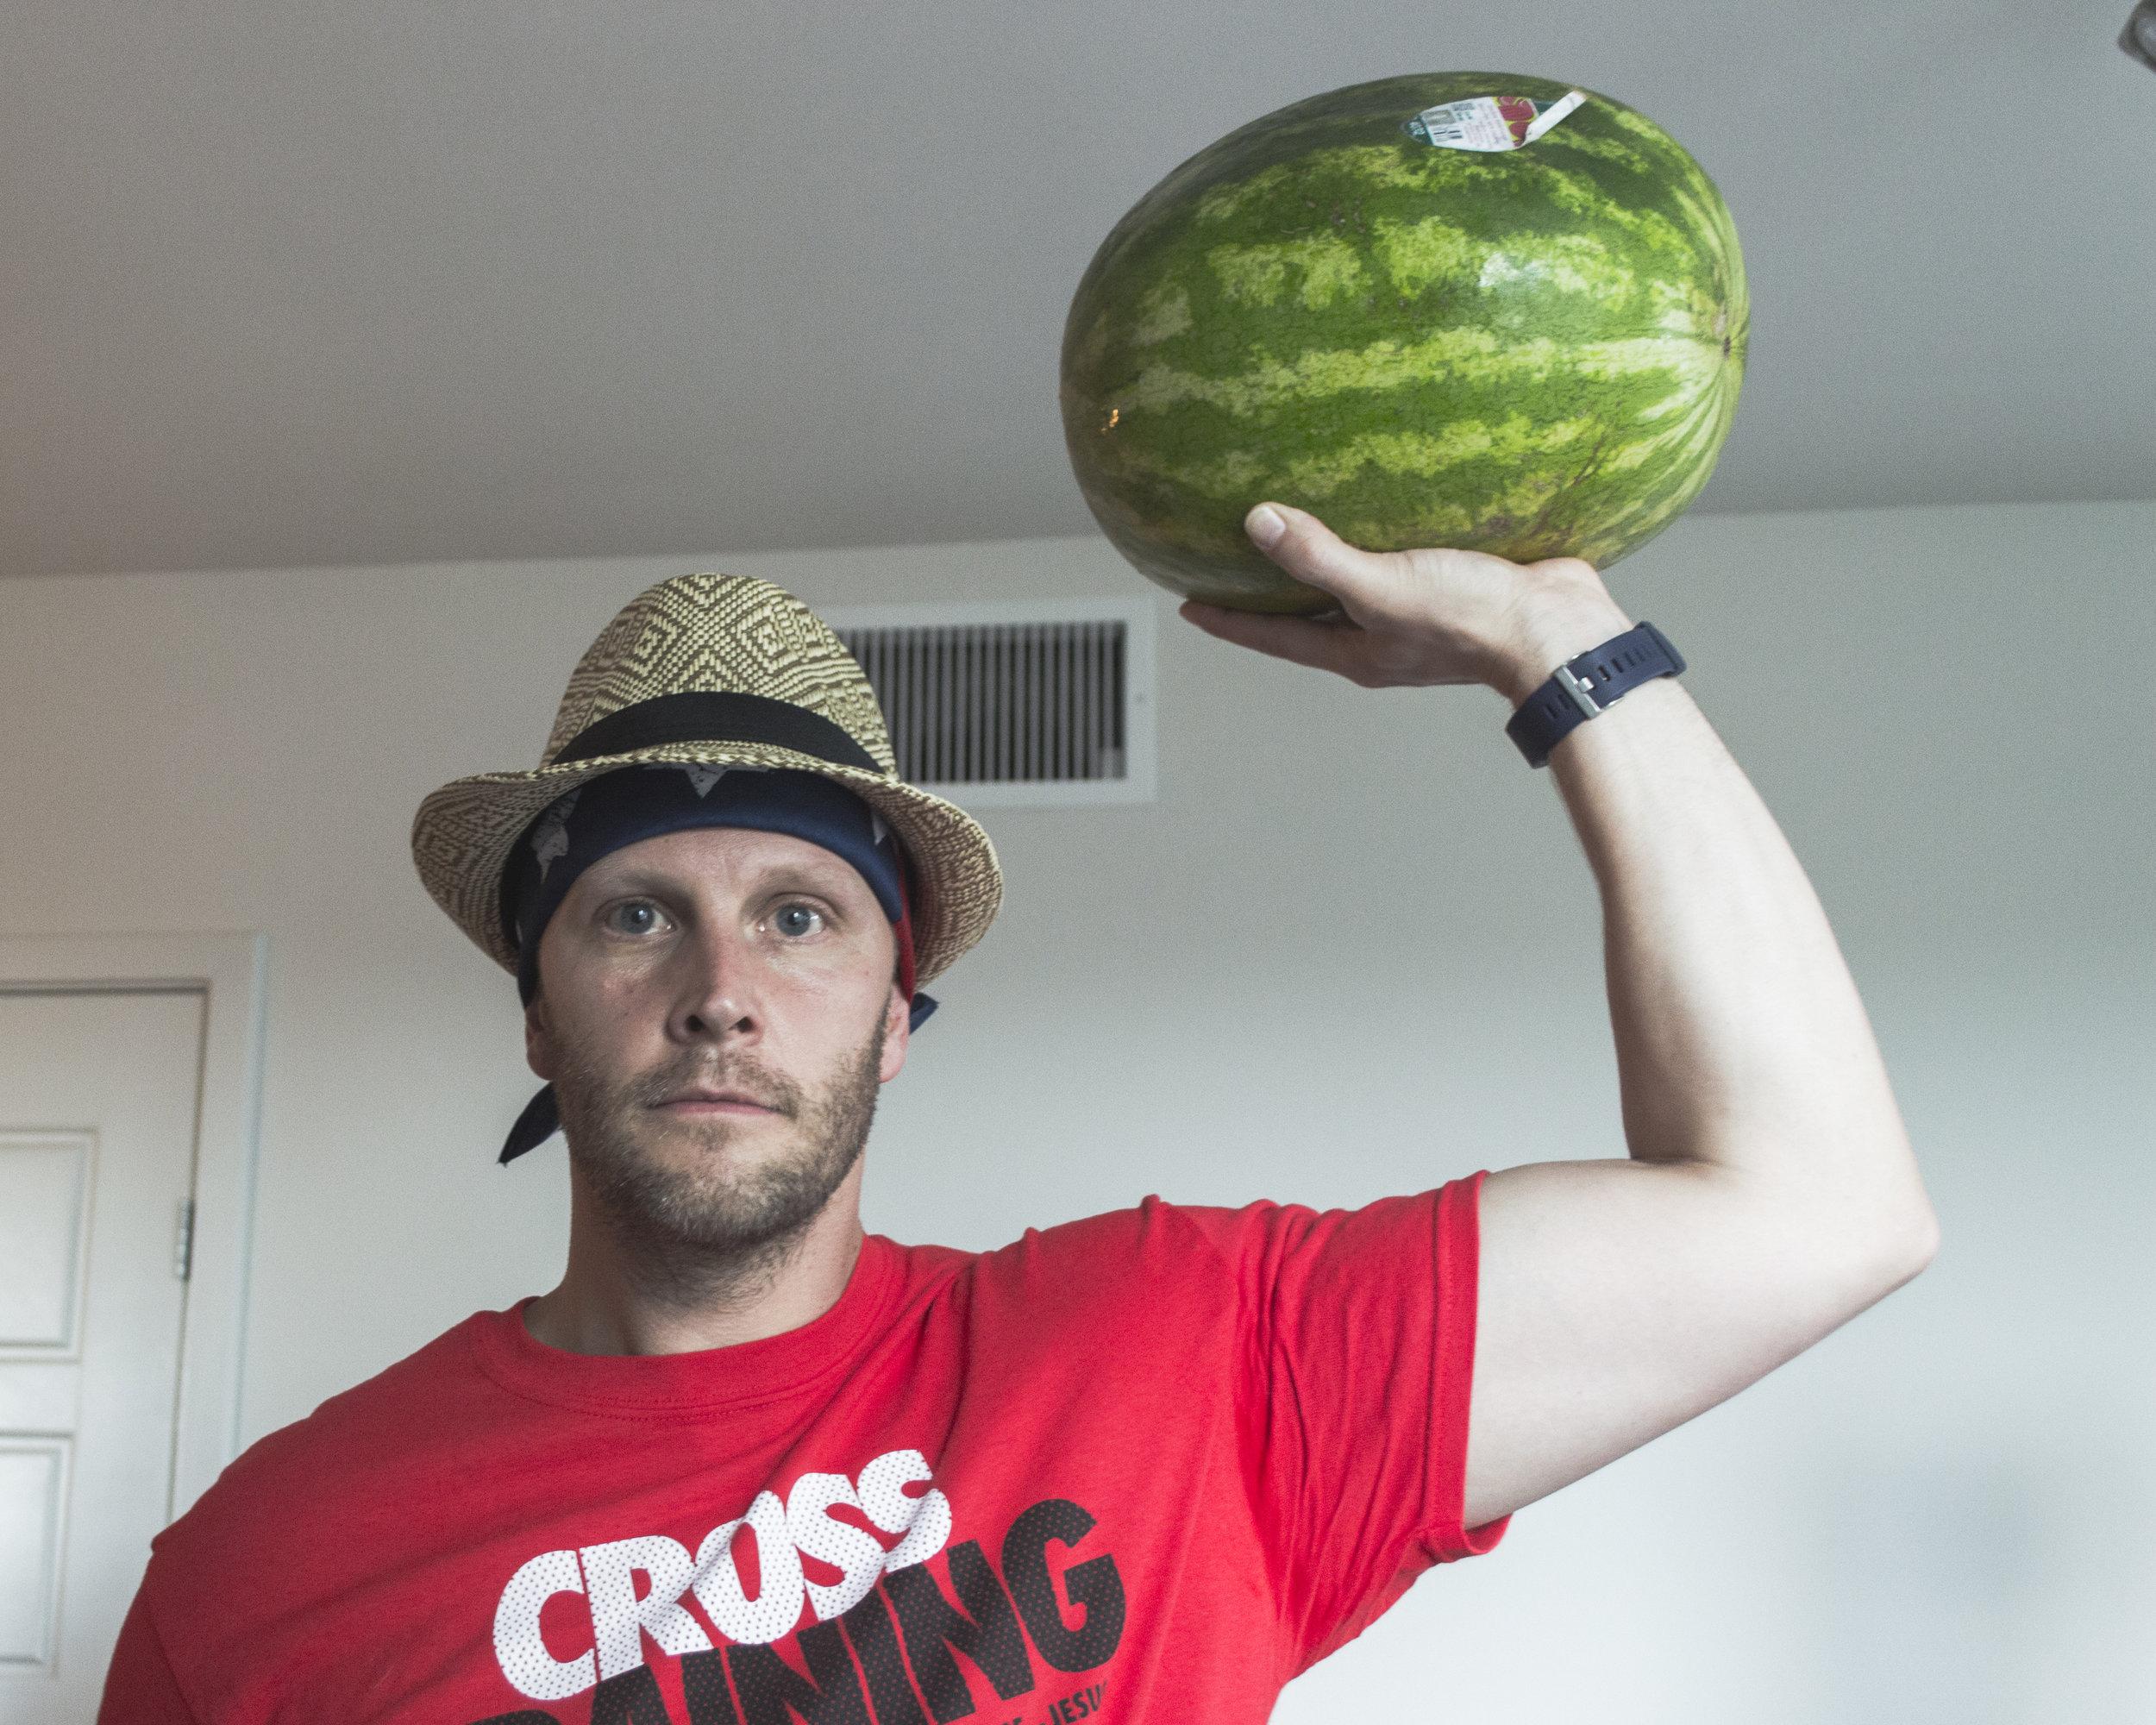 Watermelon is healthy!